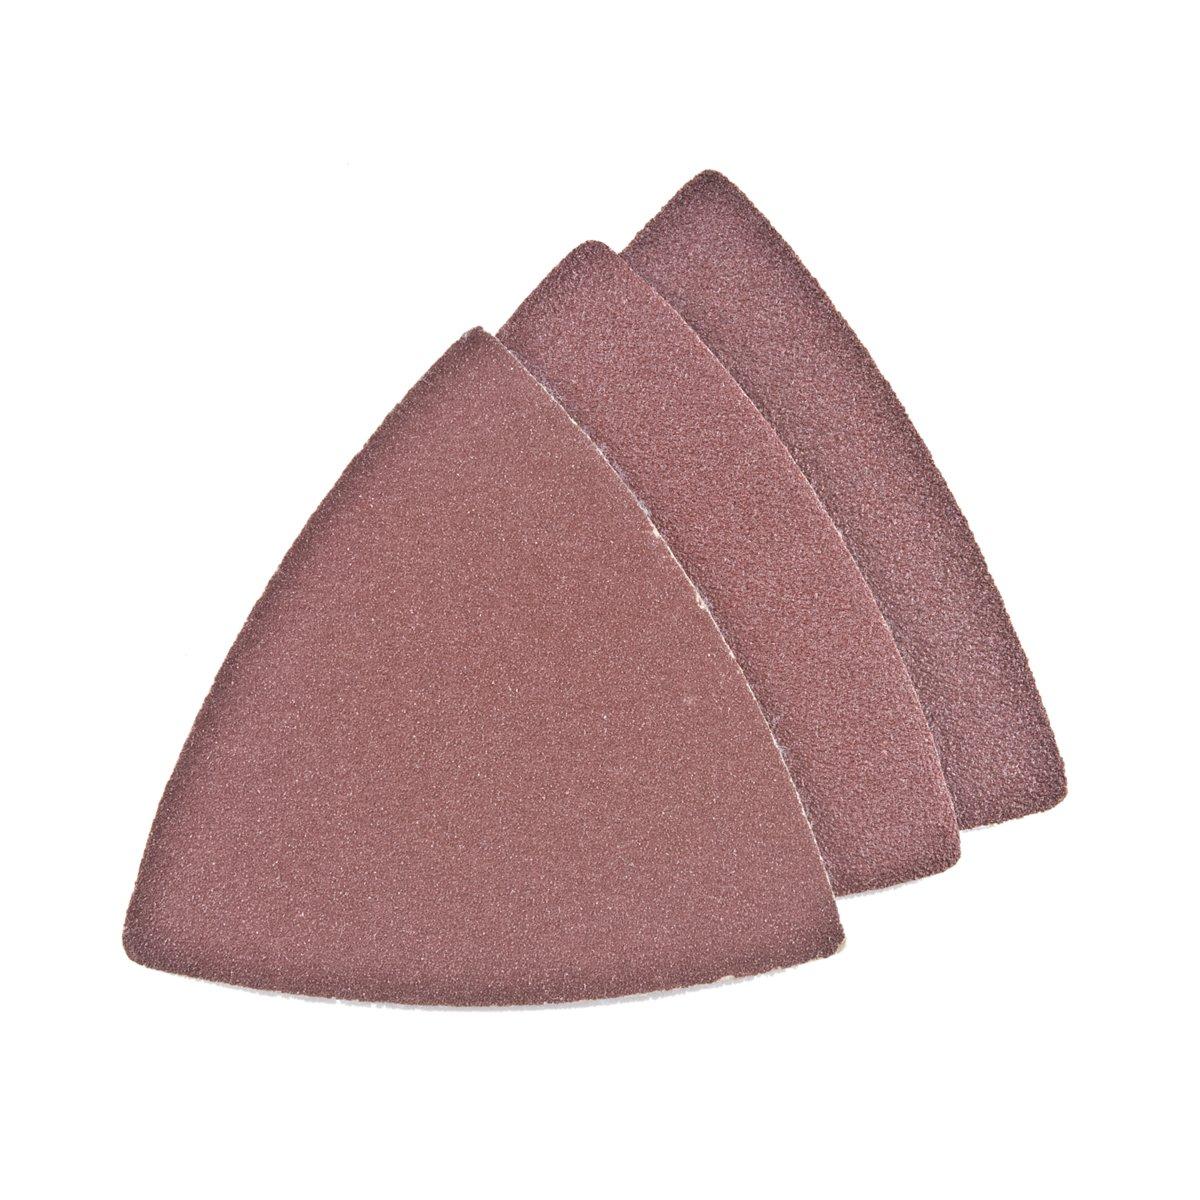 Genesis GAMT701 12-Piece Sandpaper Assortment